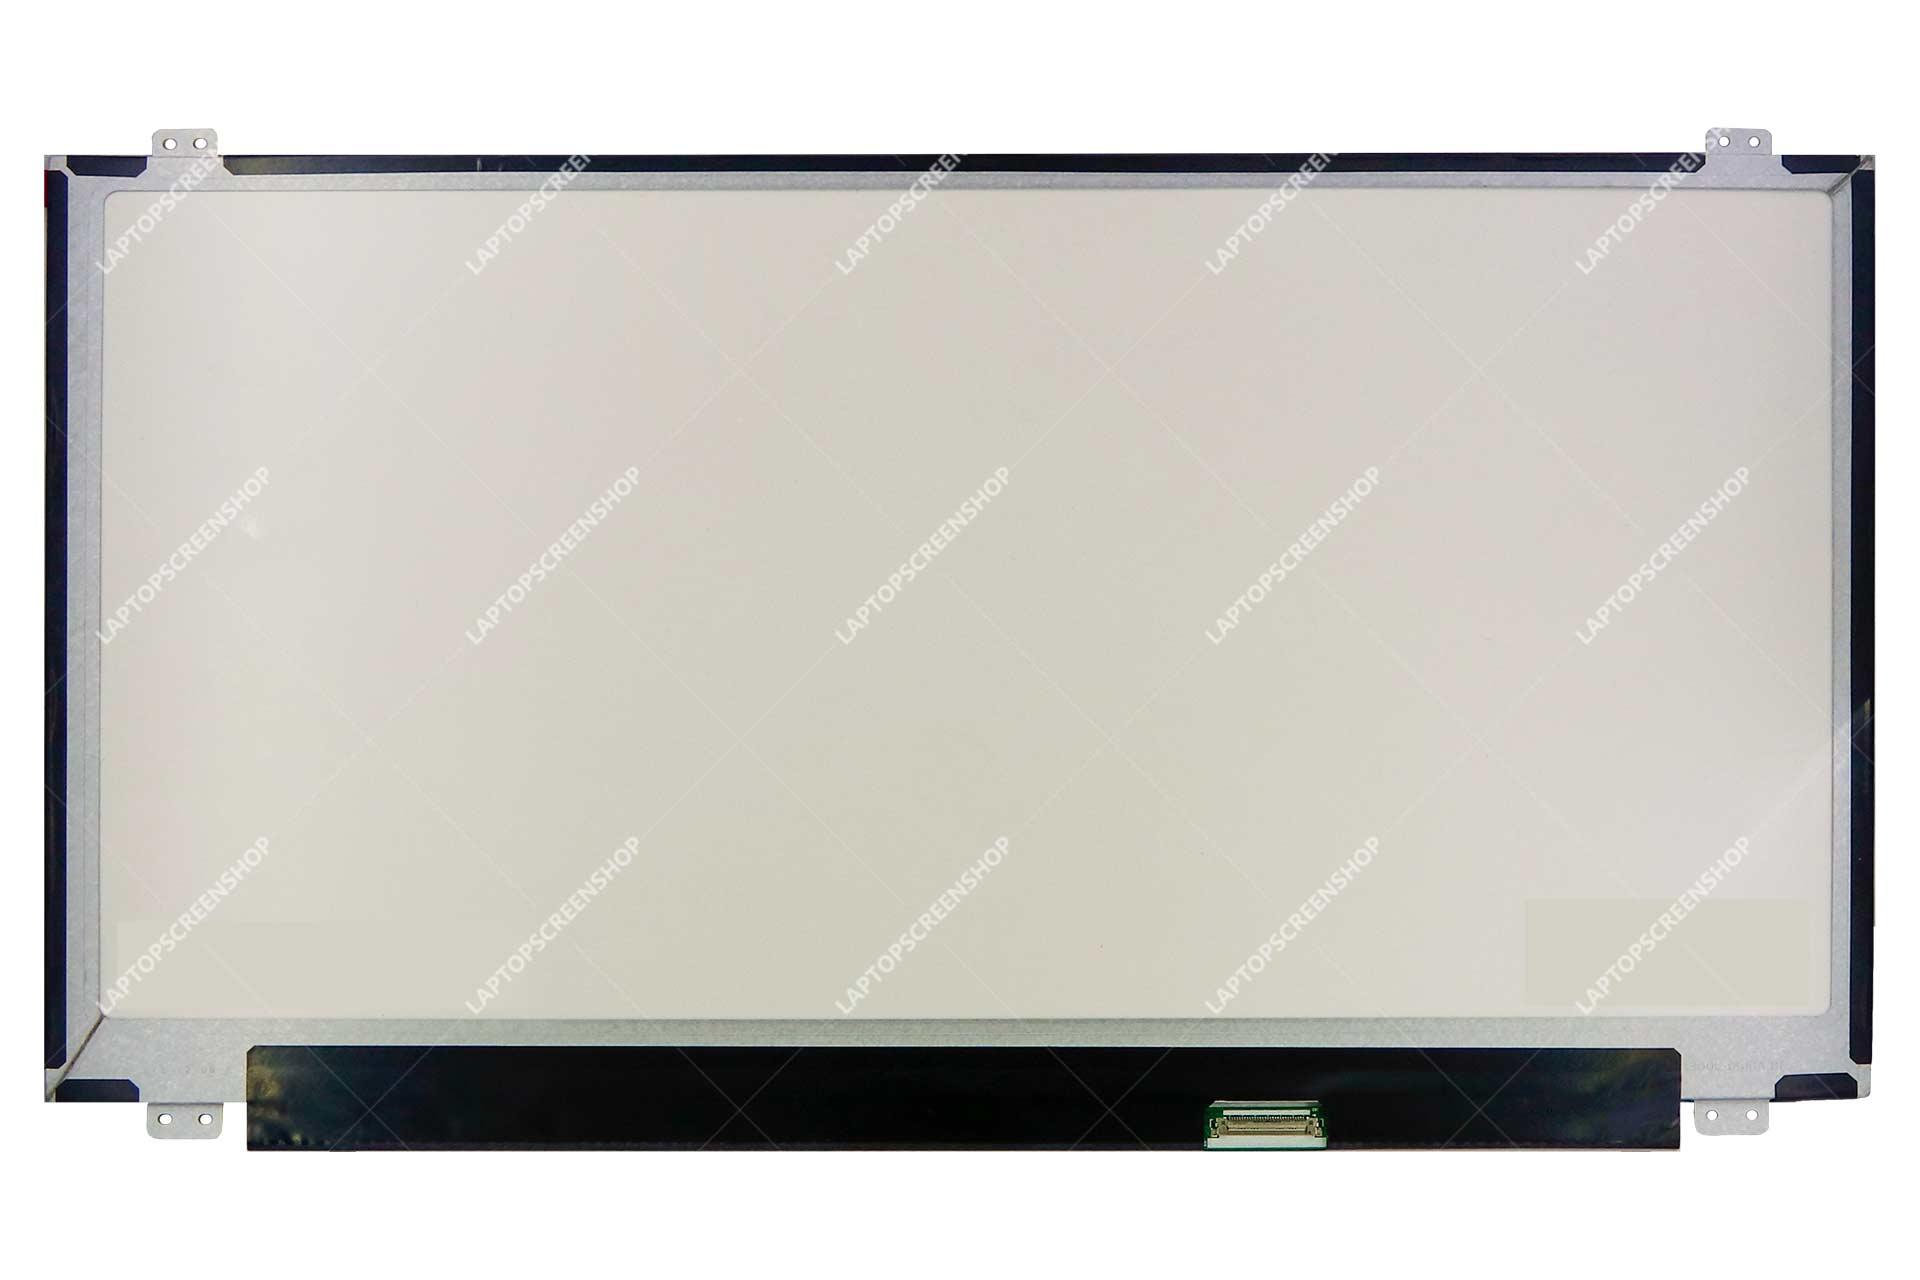 ACER-ASPIRE-E1-510-2484-LCD |HD|فروشگاه لپ تاپ اسکرين | تعمير لپ تاپ